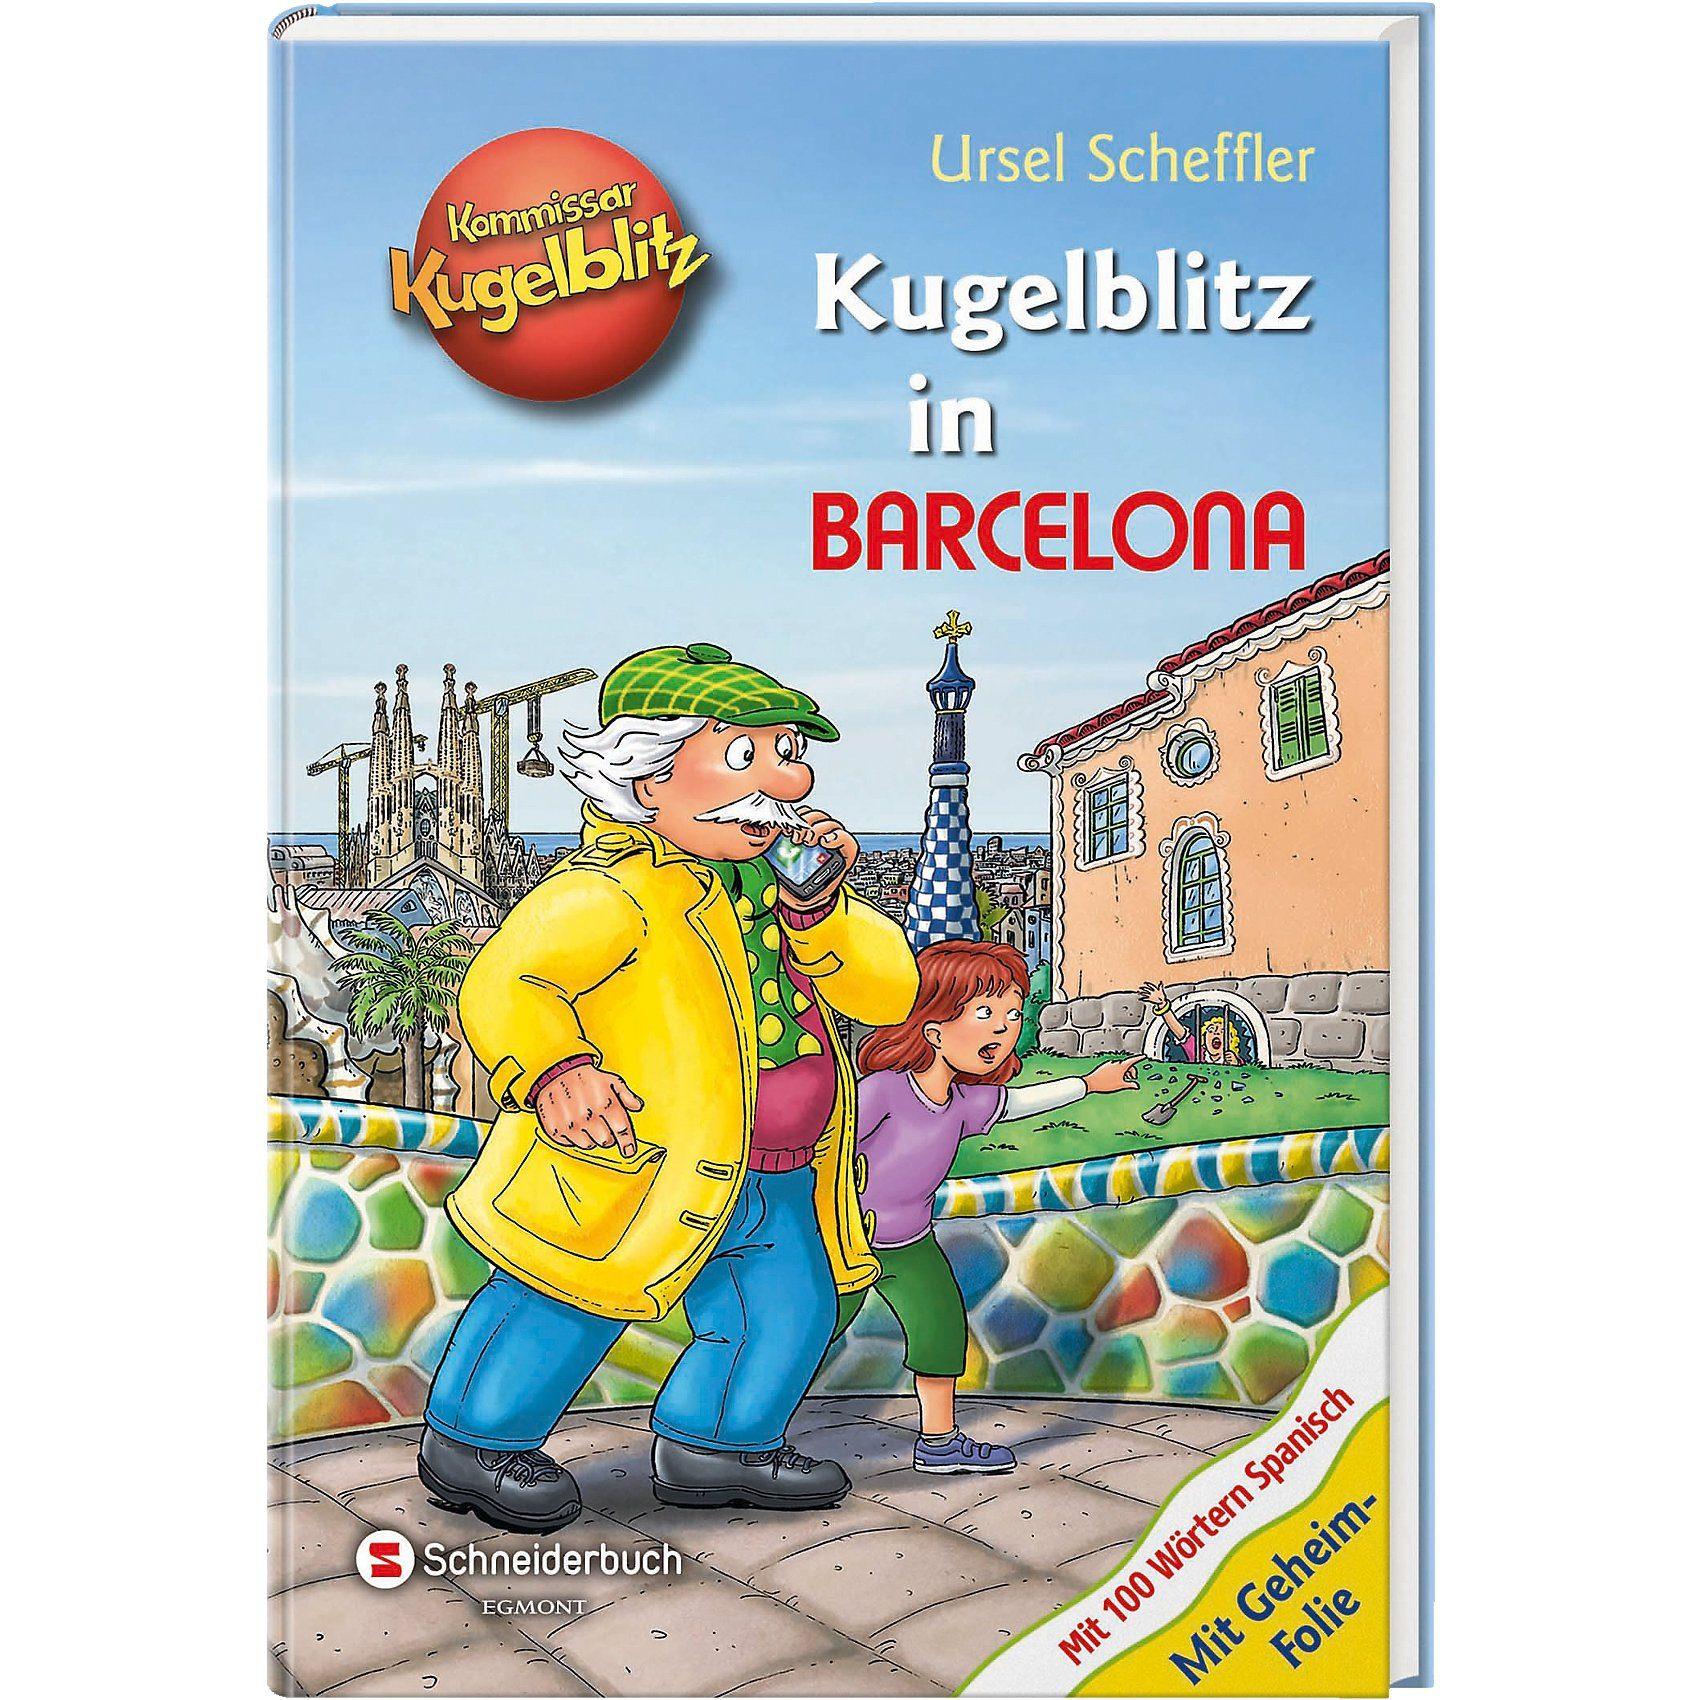 Egmont Kommissar Kugelblitz: Kugelblitz in Barcelona